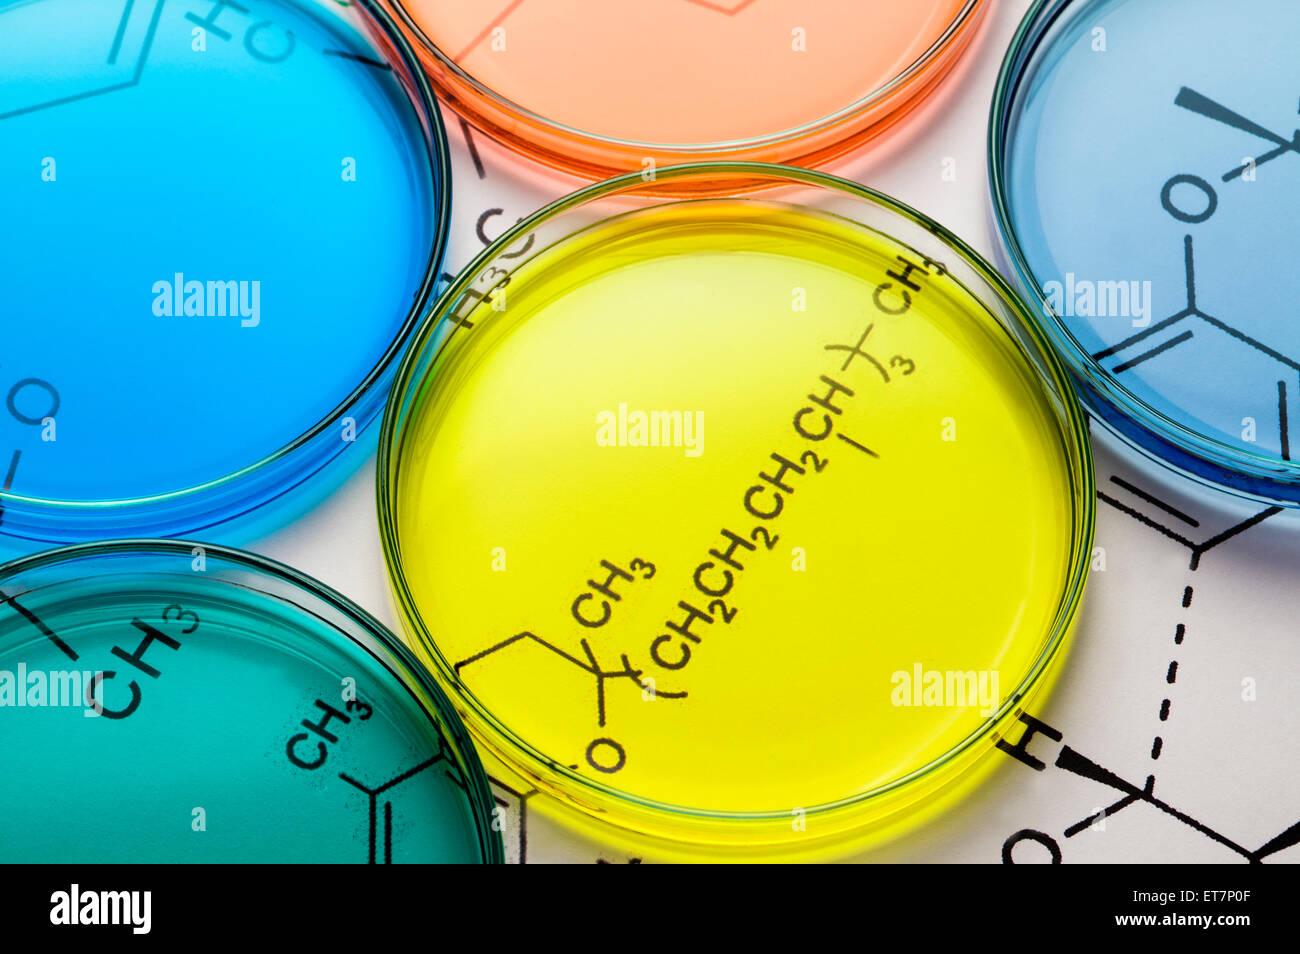 Santé et Médecine,Verrerie,Verrerie de laboratoire,ustensile,,Petri Dish Photo Stock